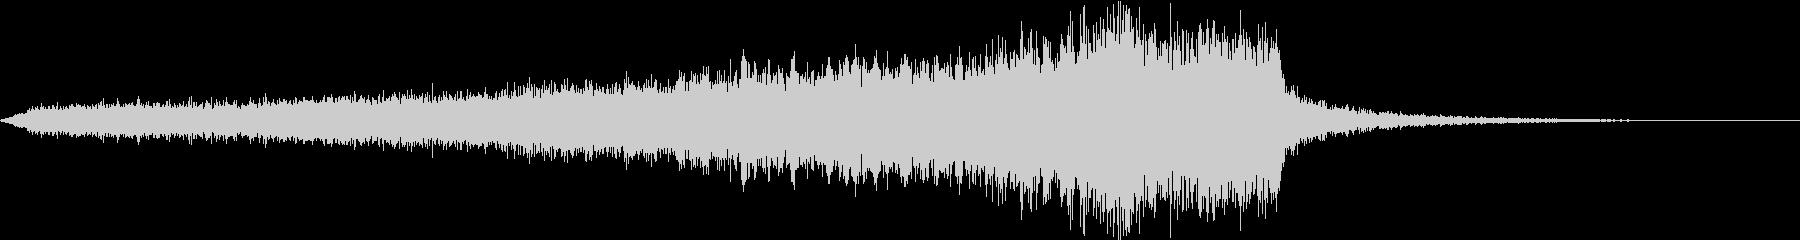 CINEMATIC RISER_27の未再生の波形